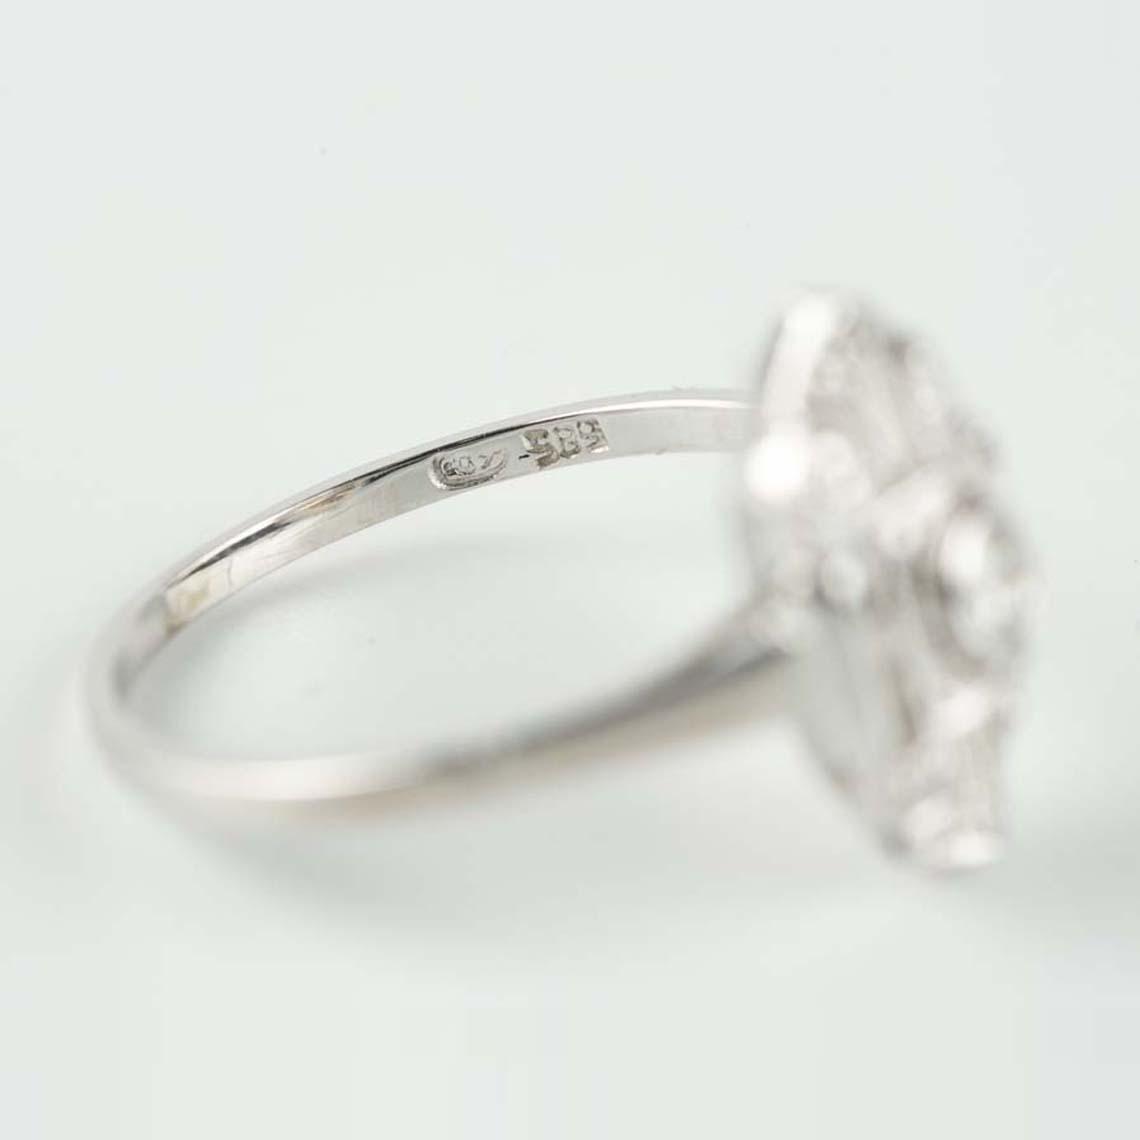 Art Deco ring